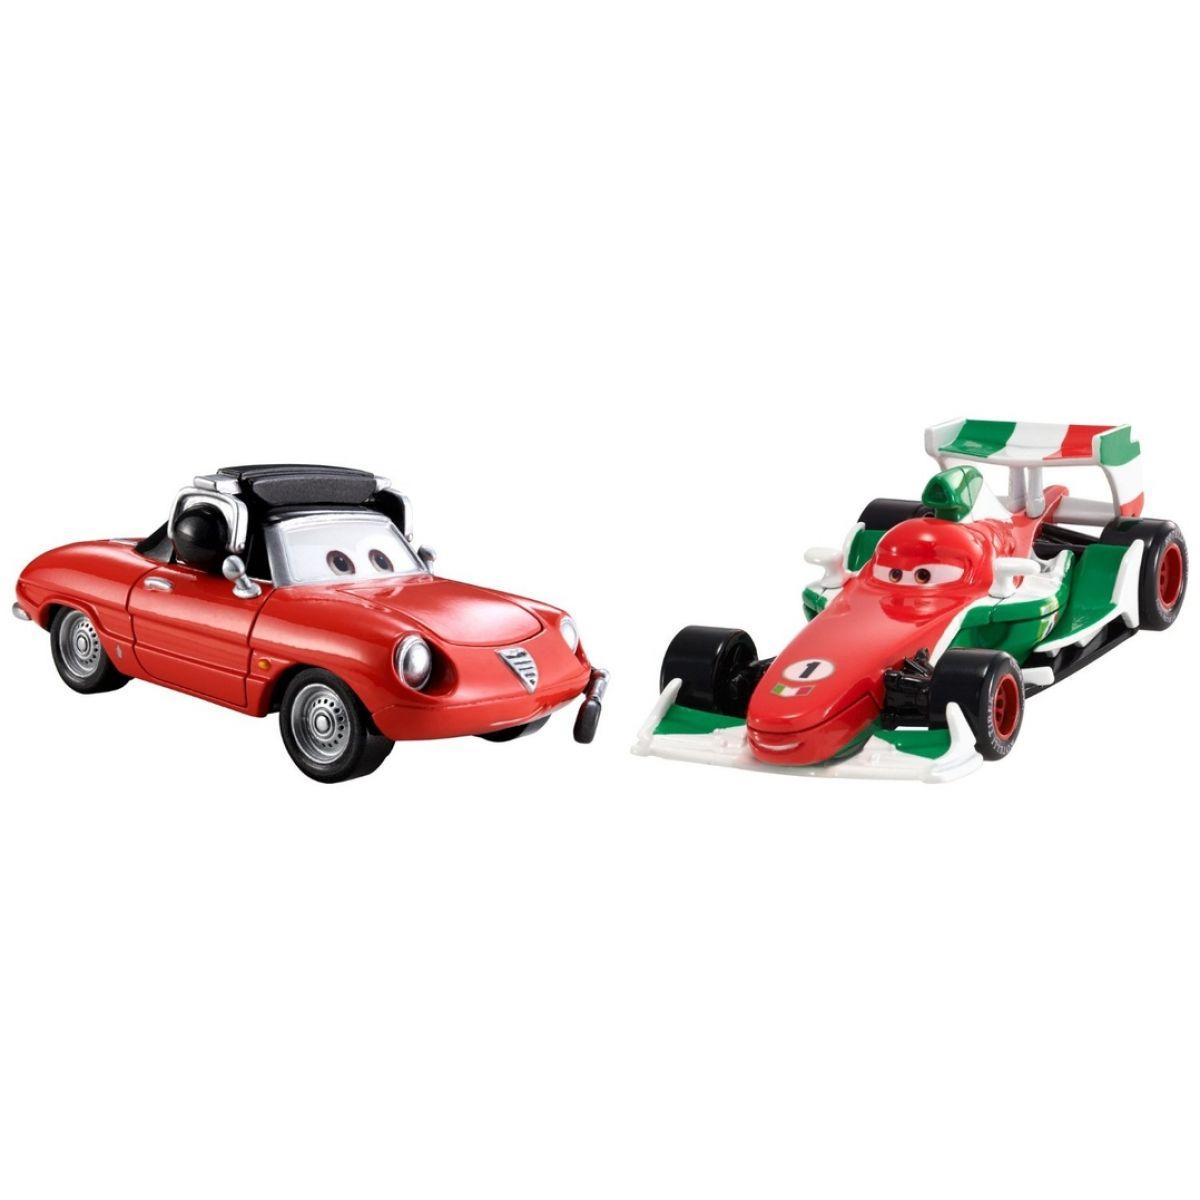 Mattel Cars 2 Autíčka 2ks - Francesco Bernoulli a Giuseppe Motorosi